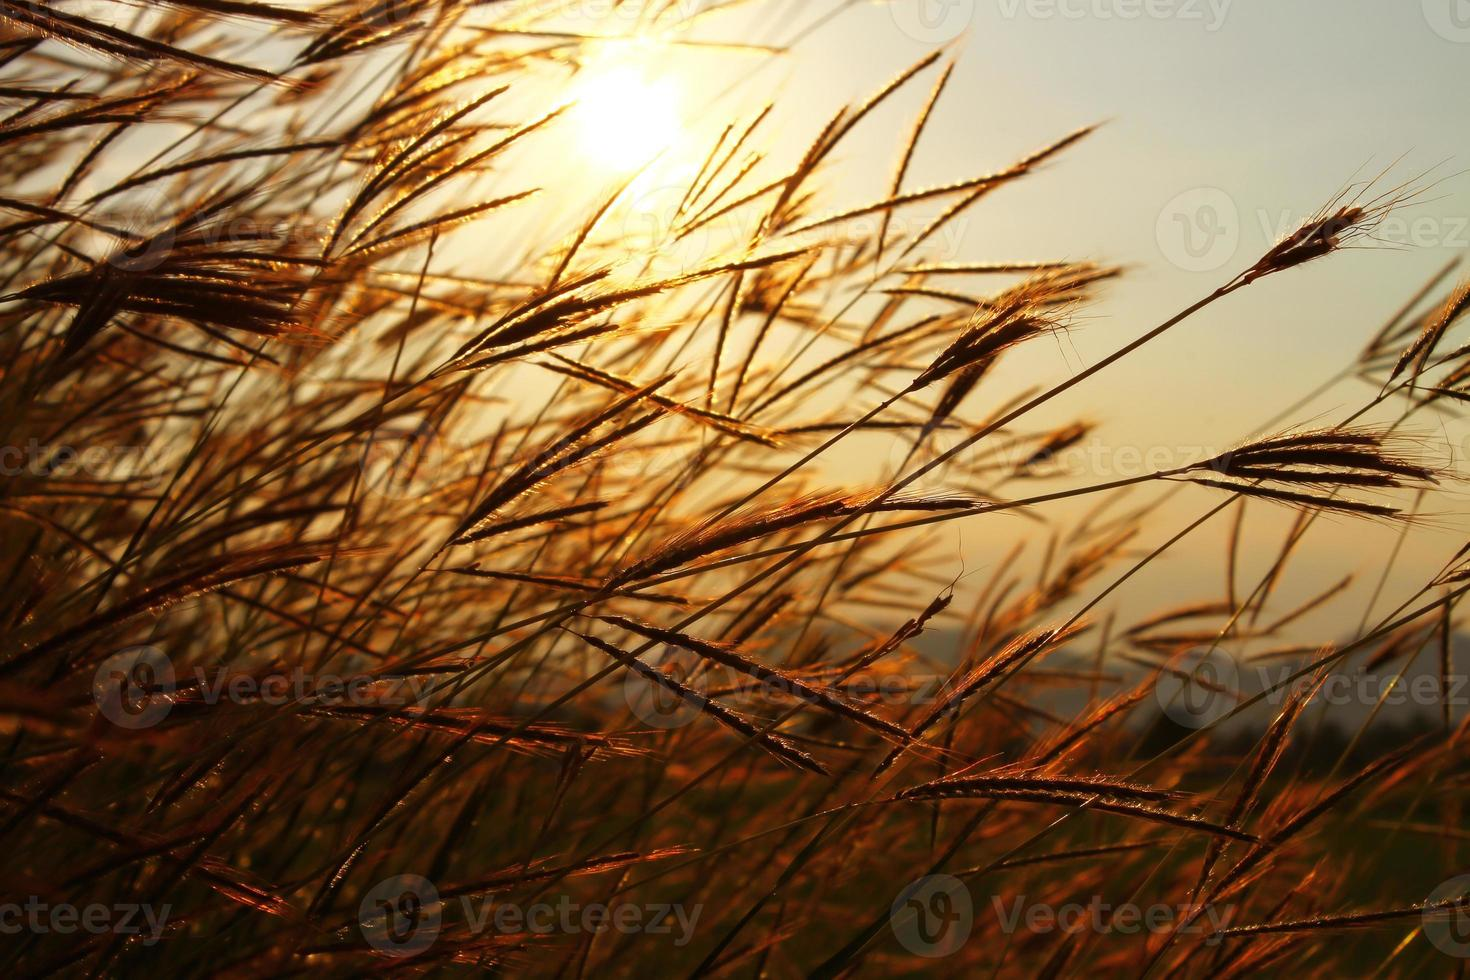 ondeggiando l'erba con lo sfondo del cielo al tramonto foto